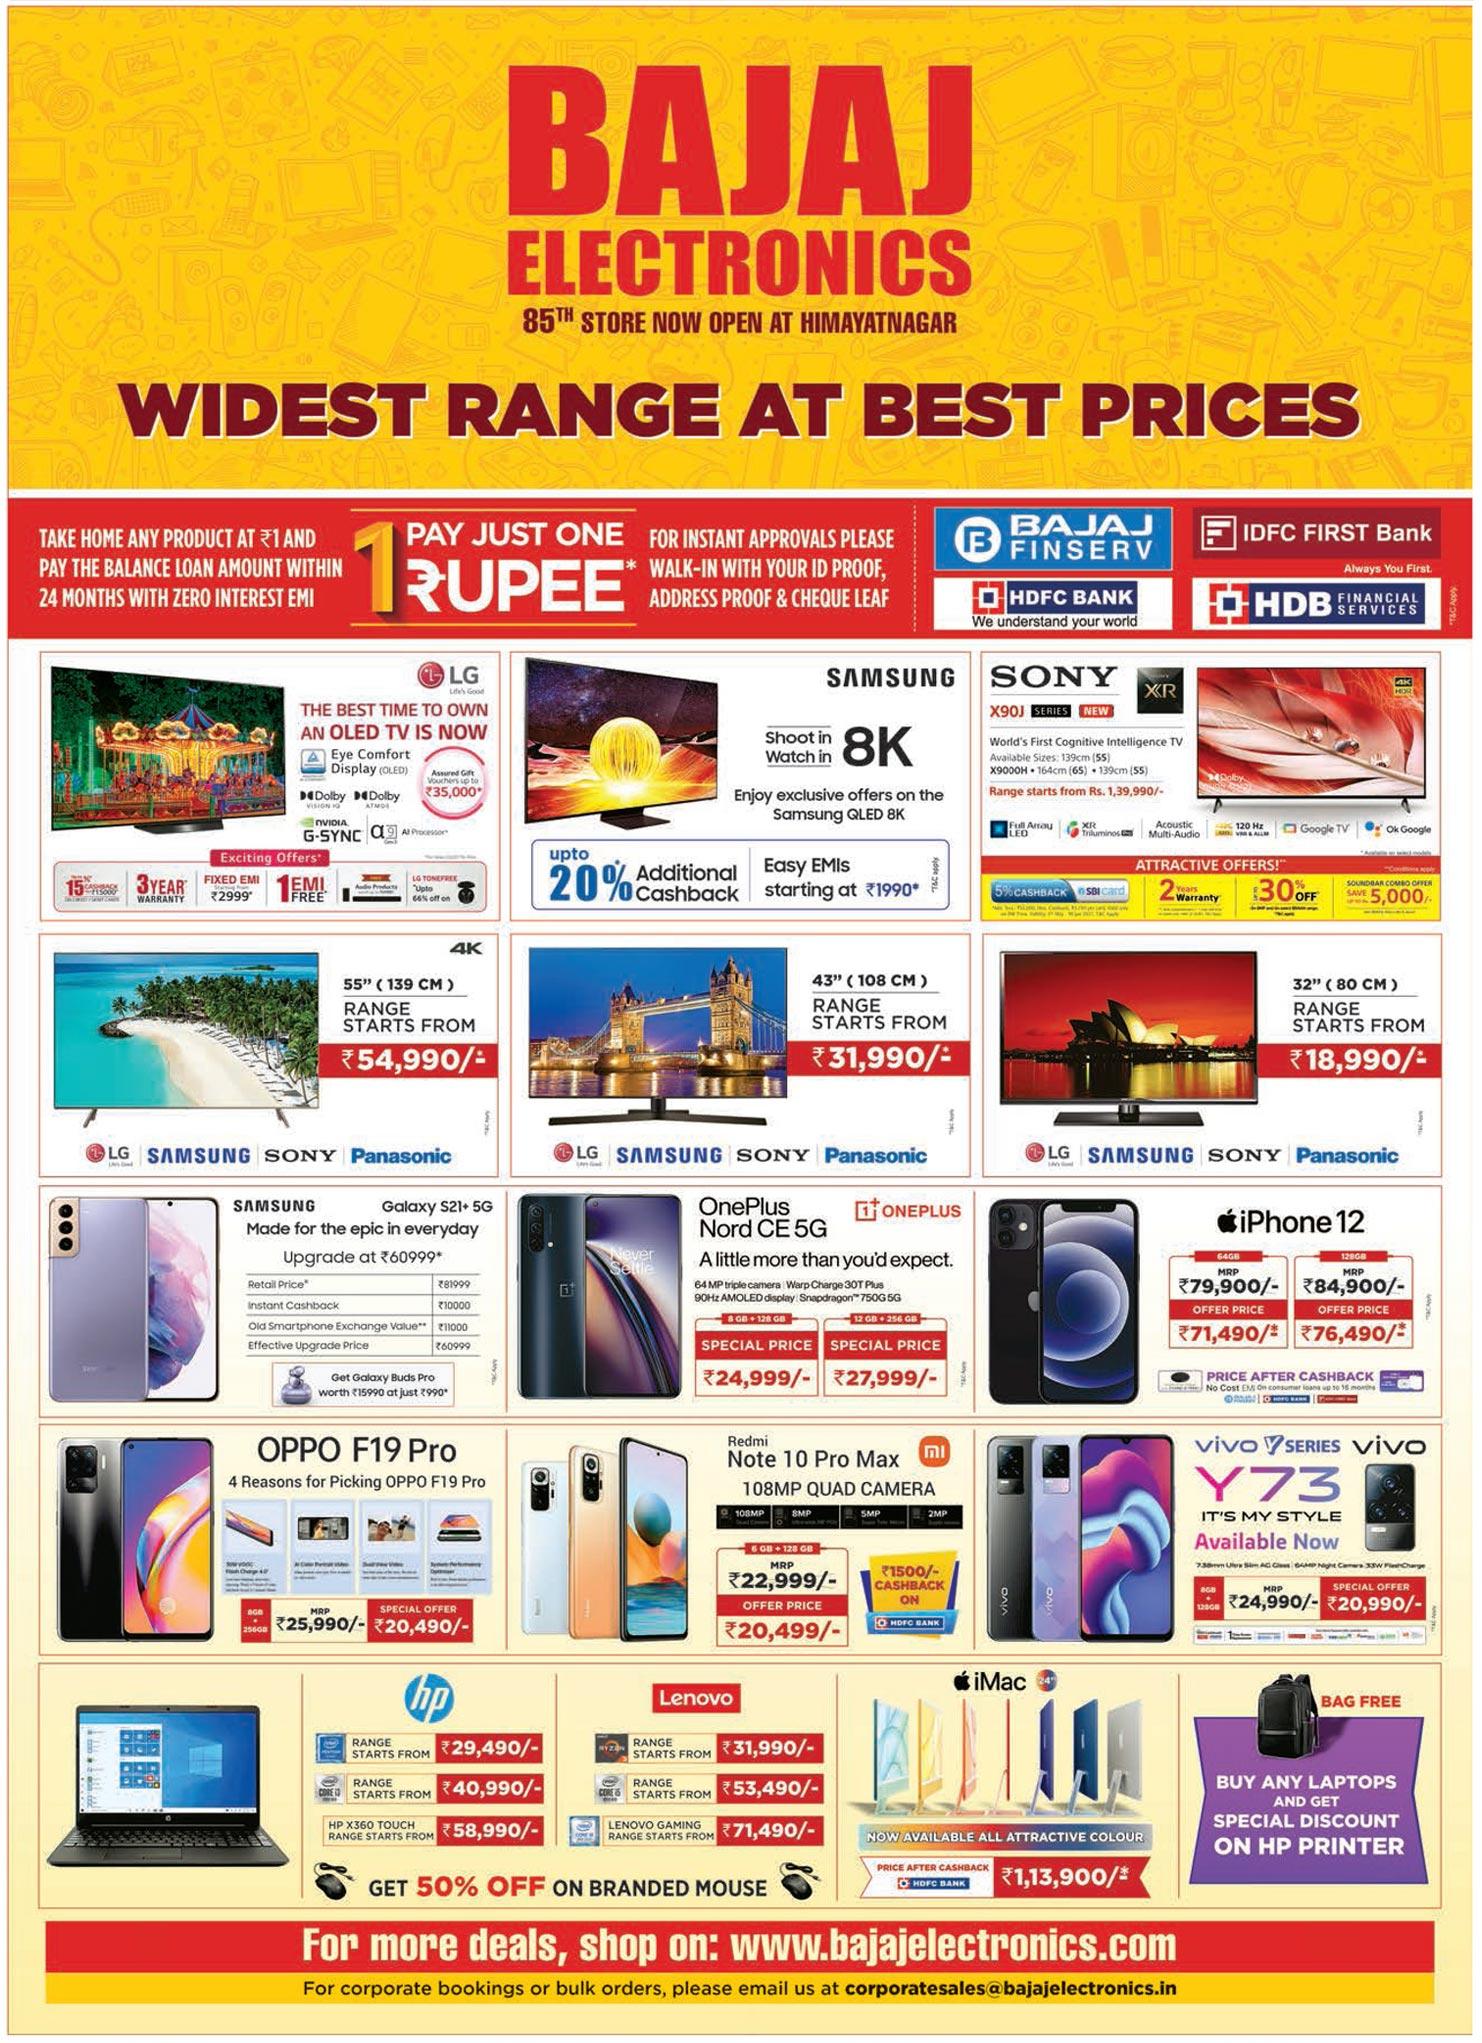 bajaj-electronics-widest-range-at-best-prices-ad-deccan-chroncile-hyderabad-19-06-2021